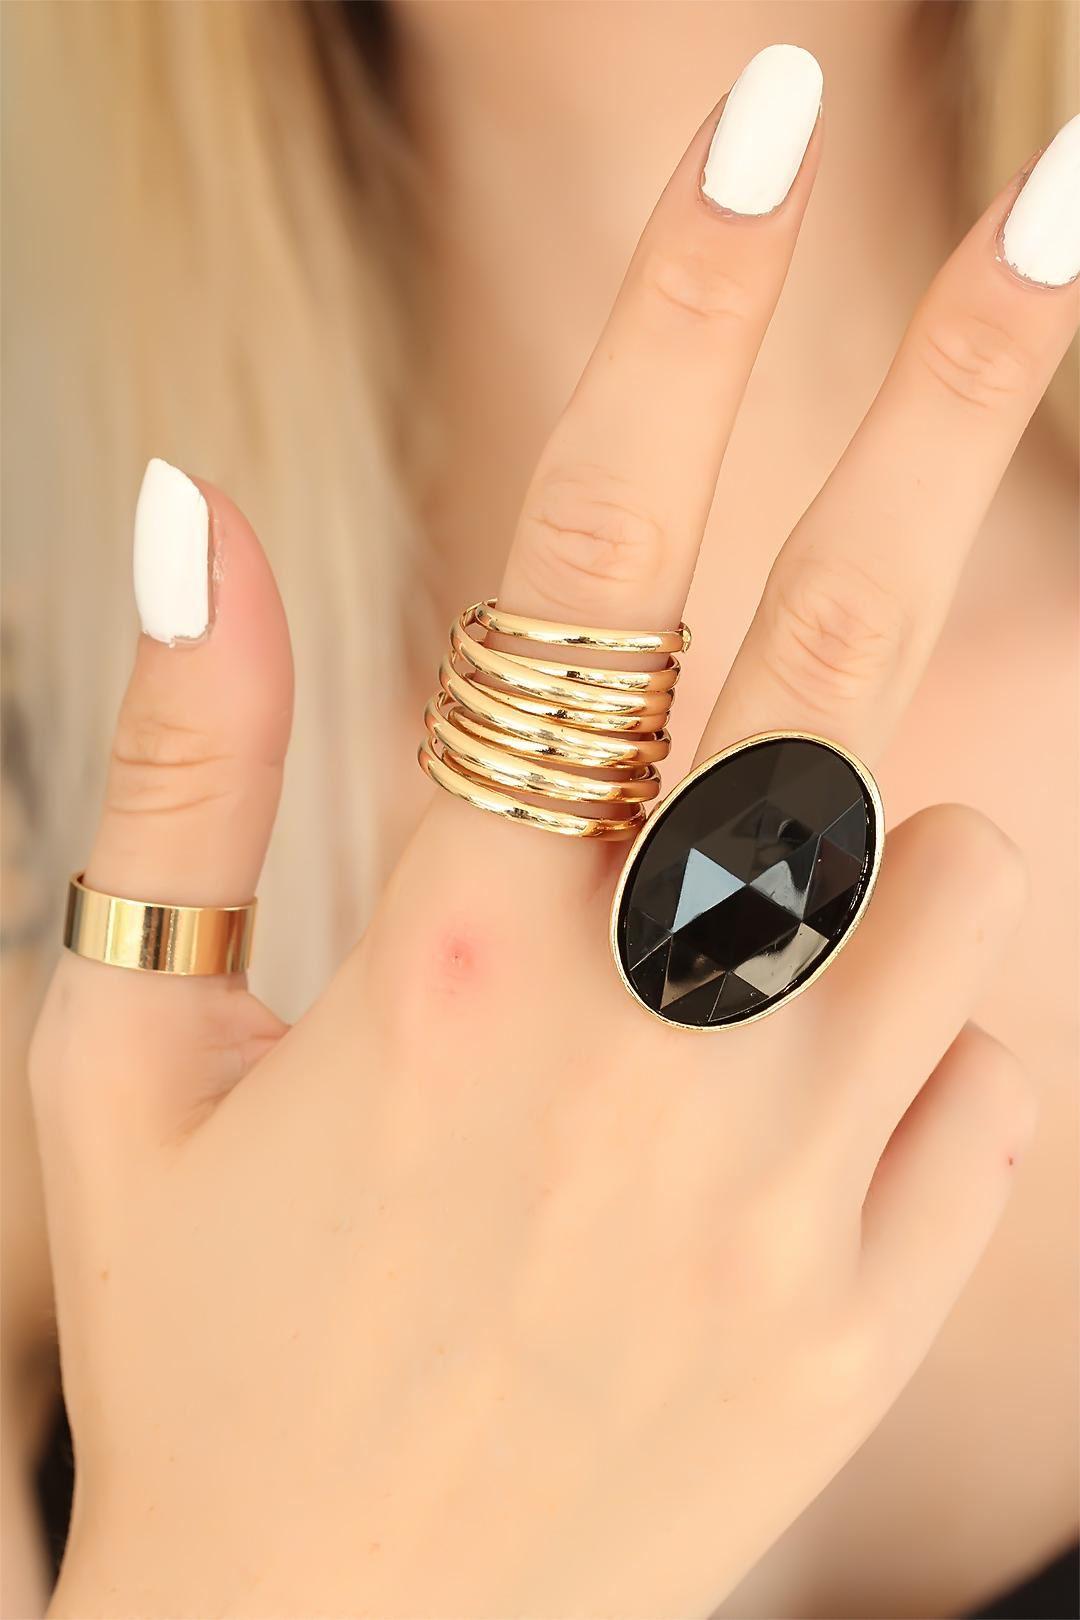 Trend Siyah Taşlı Gold Renk Metal Bayan Yüzük Seti